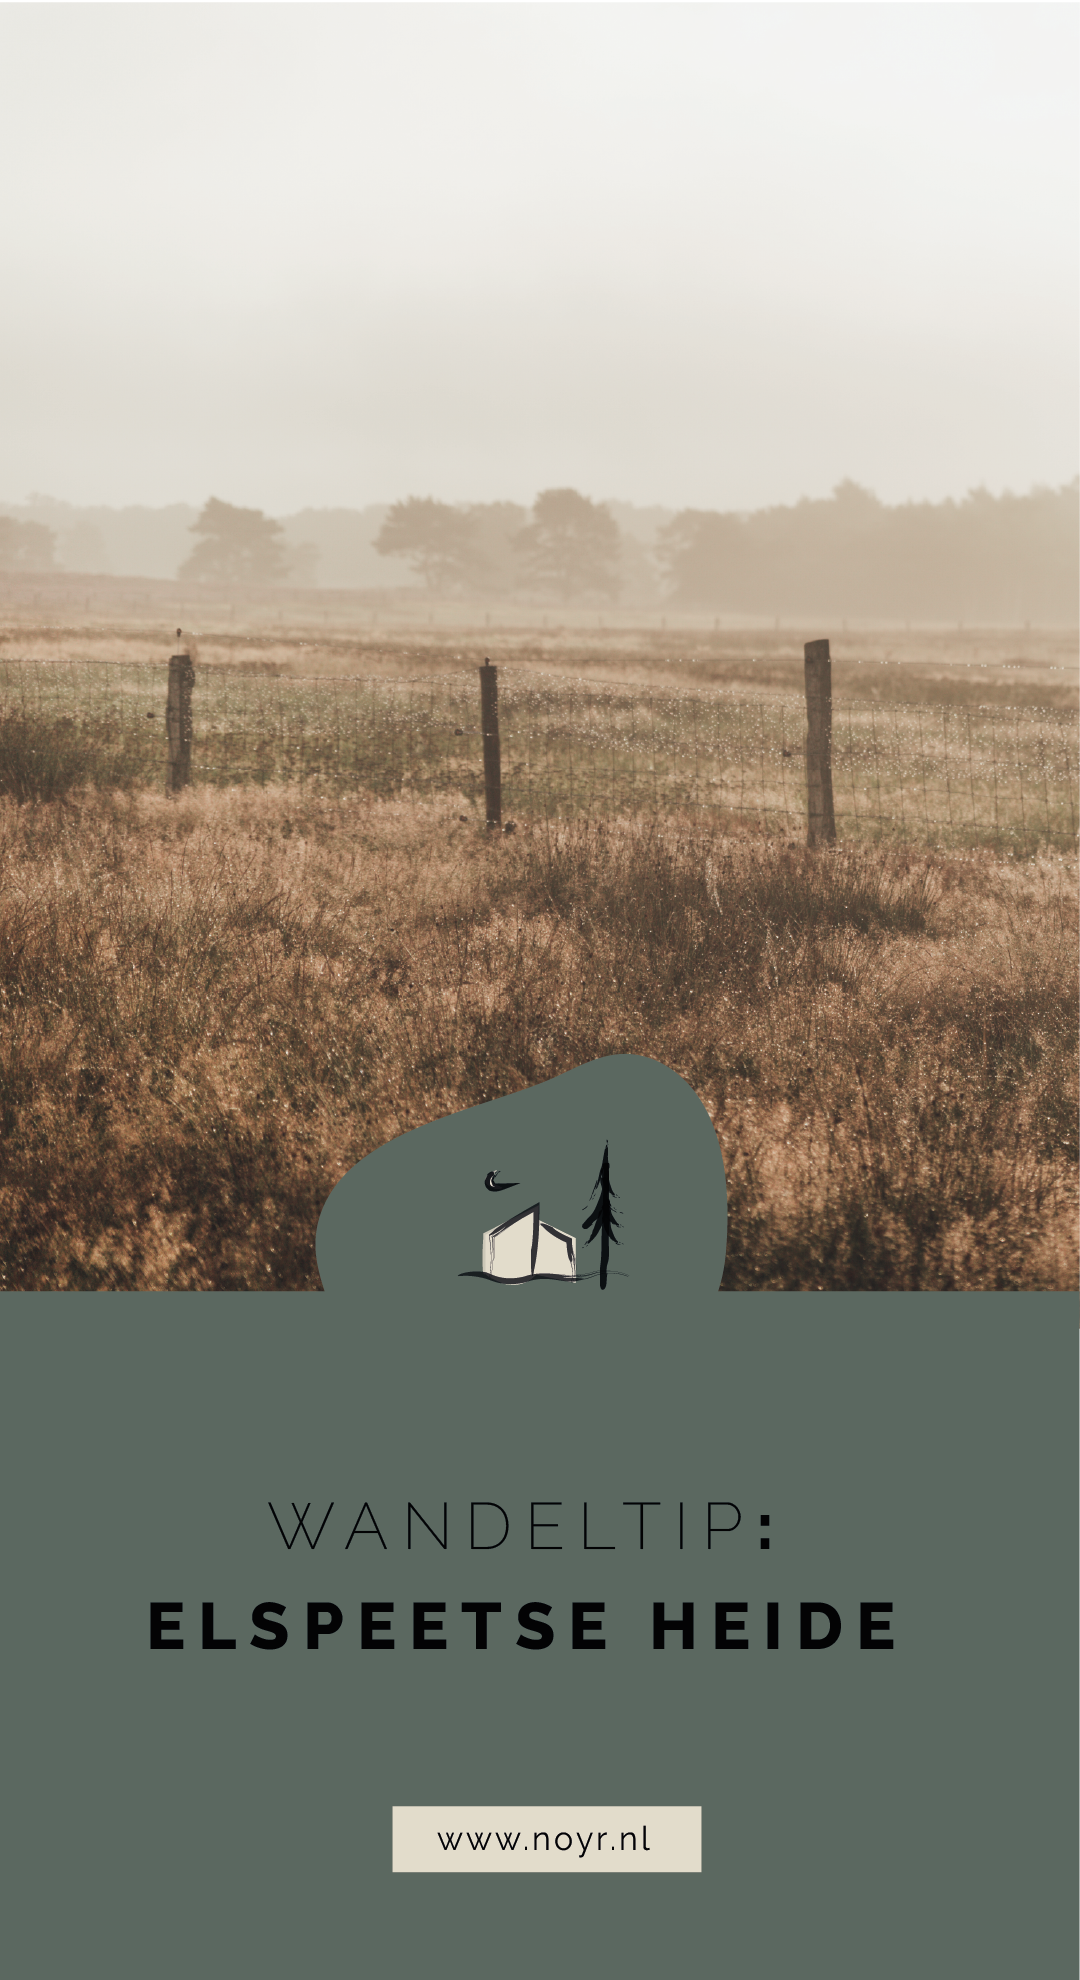 Elspeetse Heide | wandelen | zonsopgang | wandelen in nederland | wandelroutes | veluwe